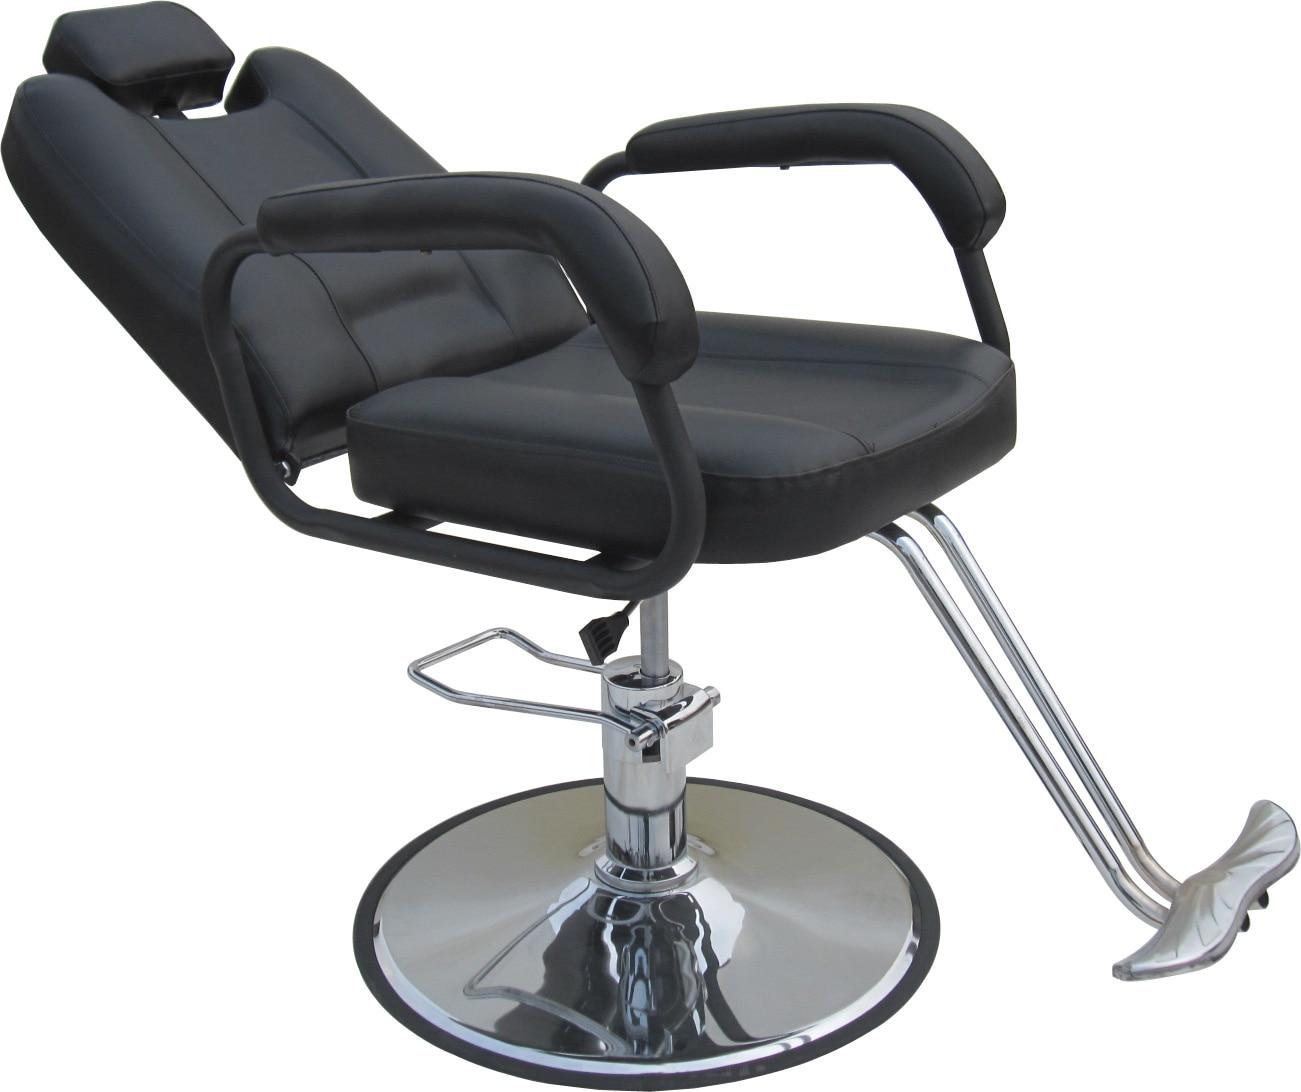 Barber Chair Factory Direct Haircut Chair Hair Salon Special Hairdressing Chair Down Lift Hairdressing Chair Barber Shop Chair